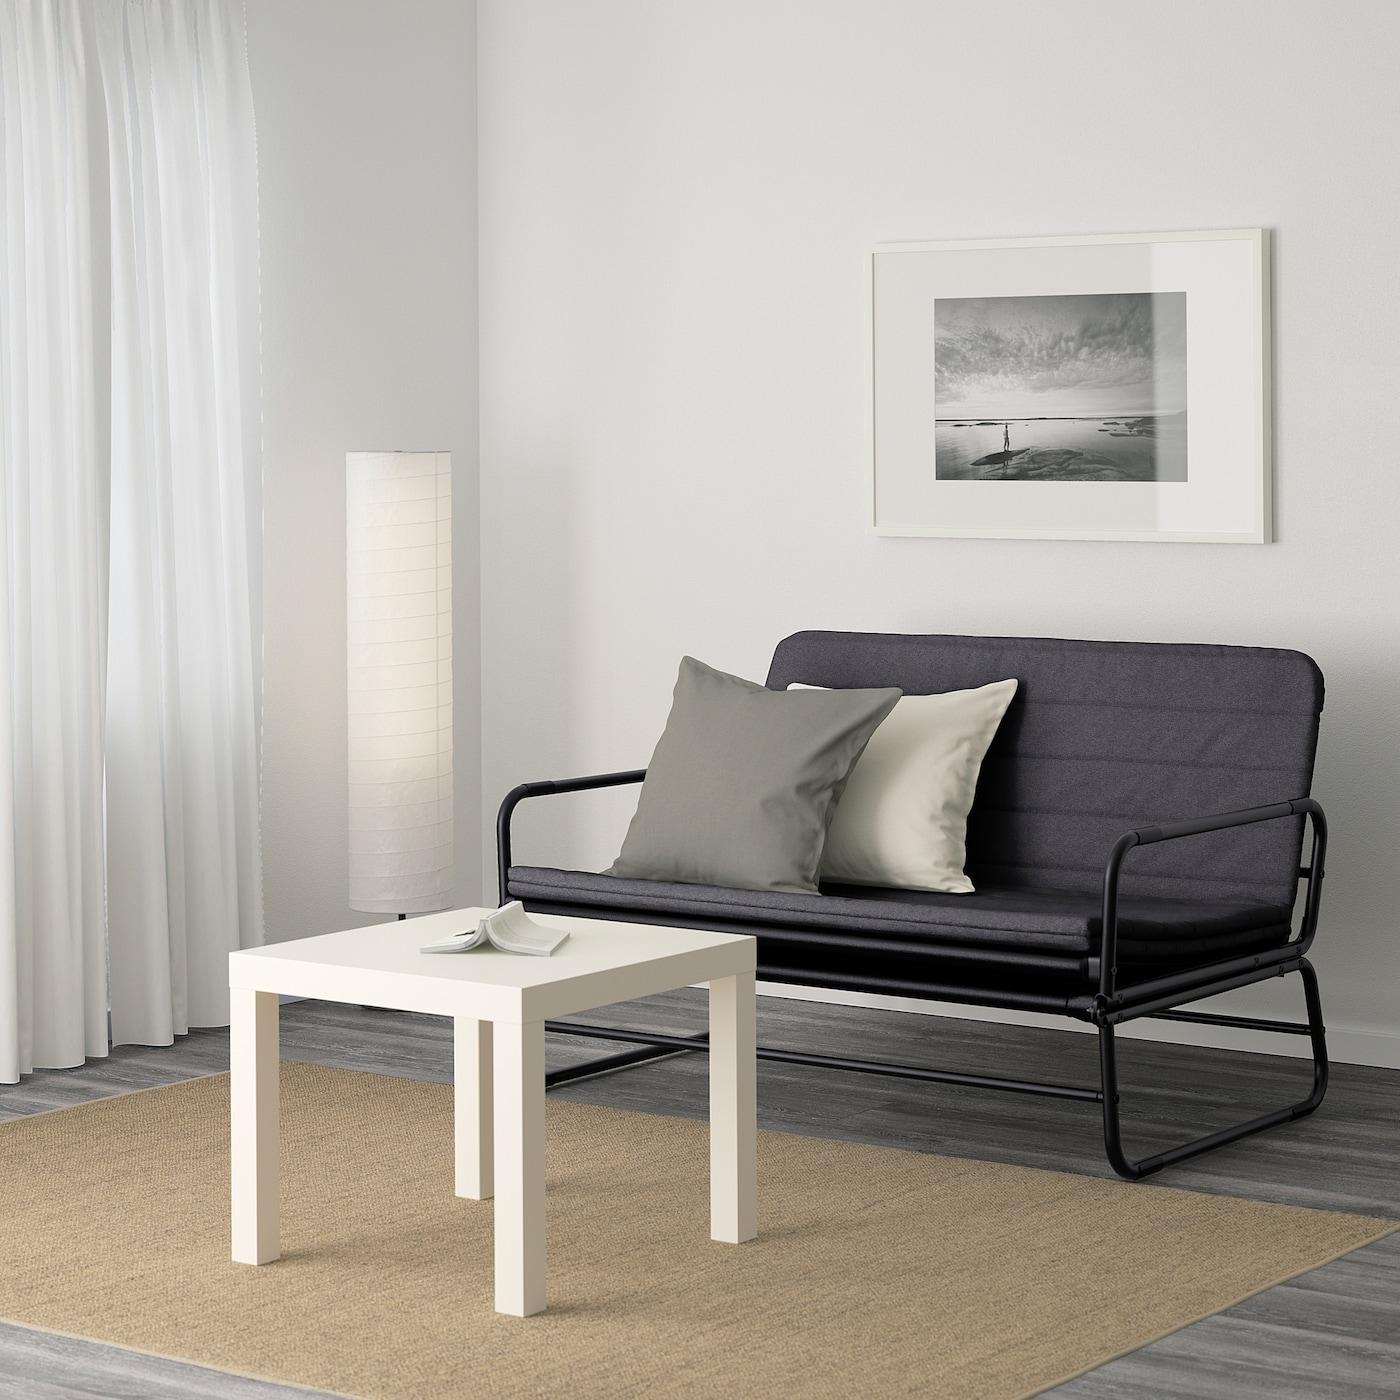 HAMMARN Sofa-bed, Knisa dark grey/black, 120 cm